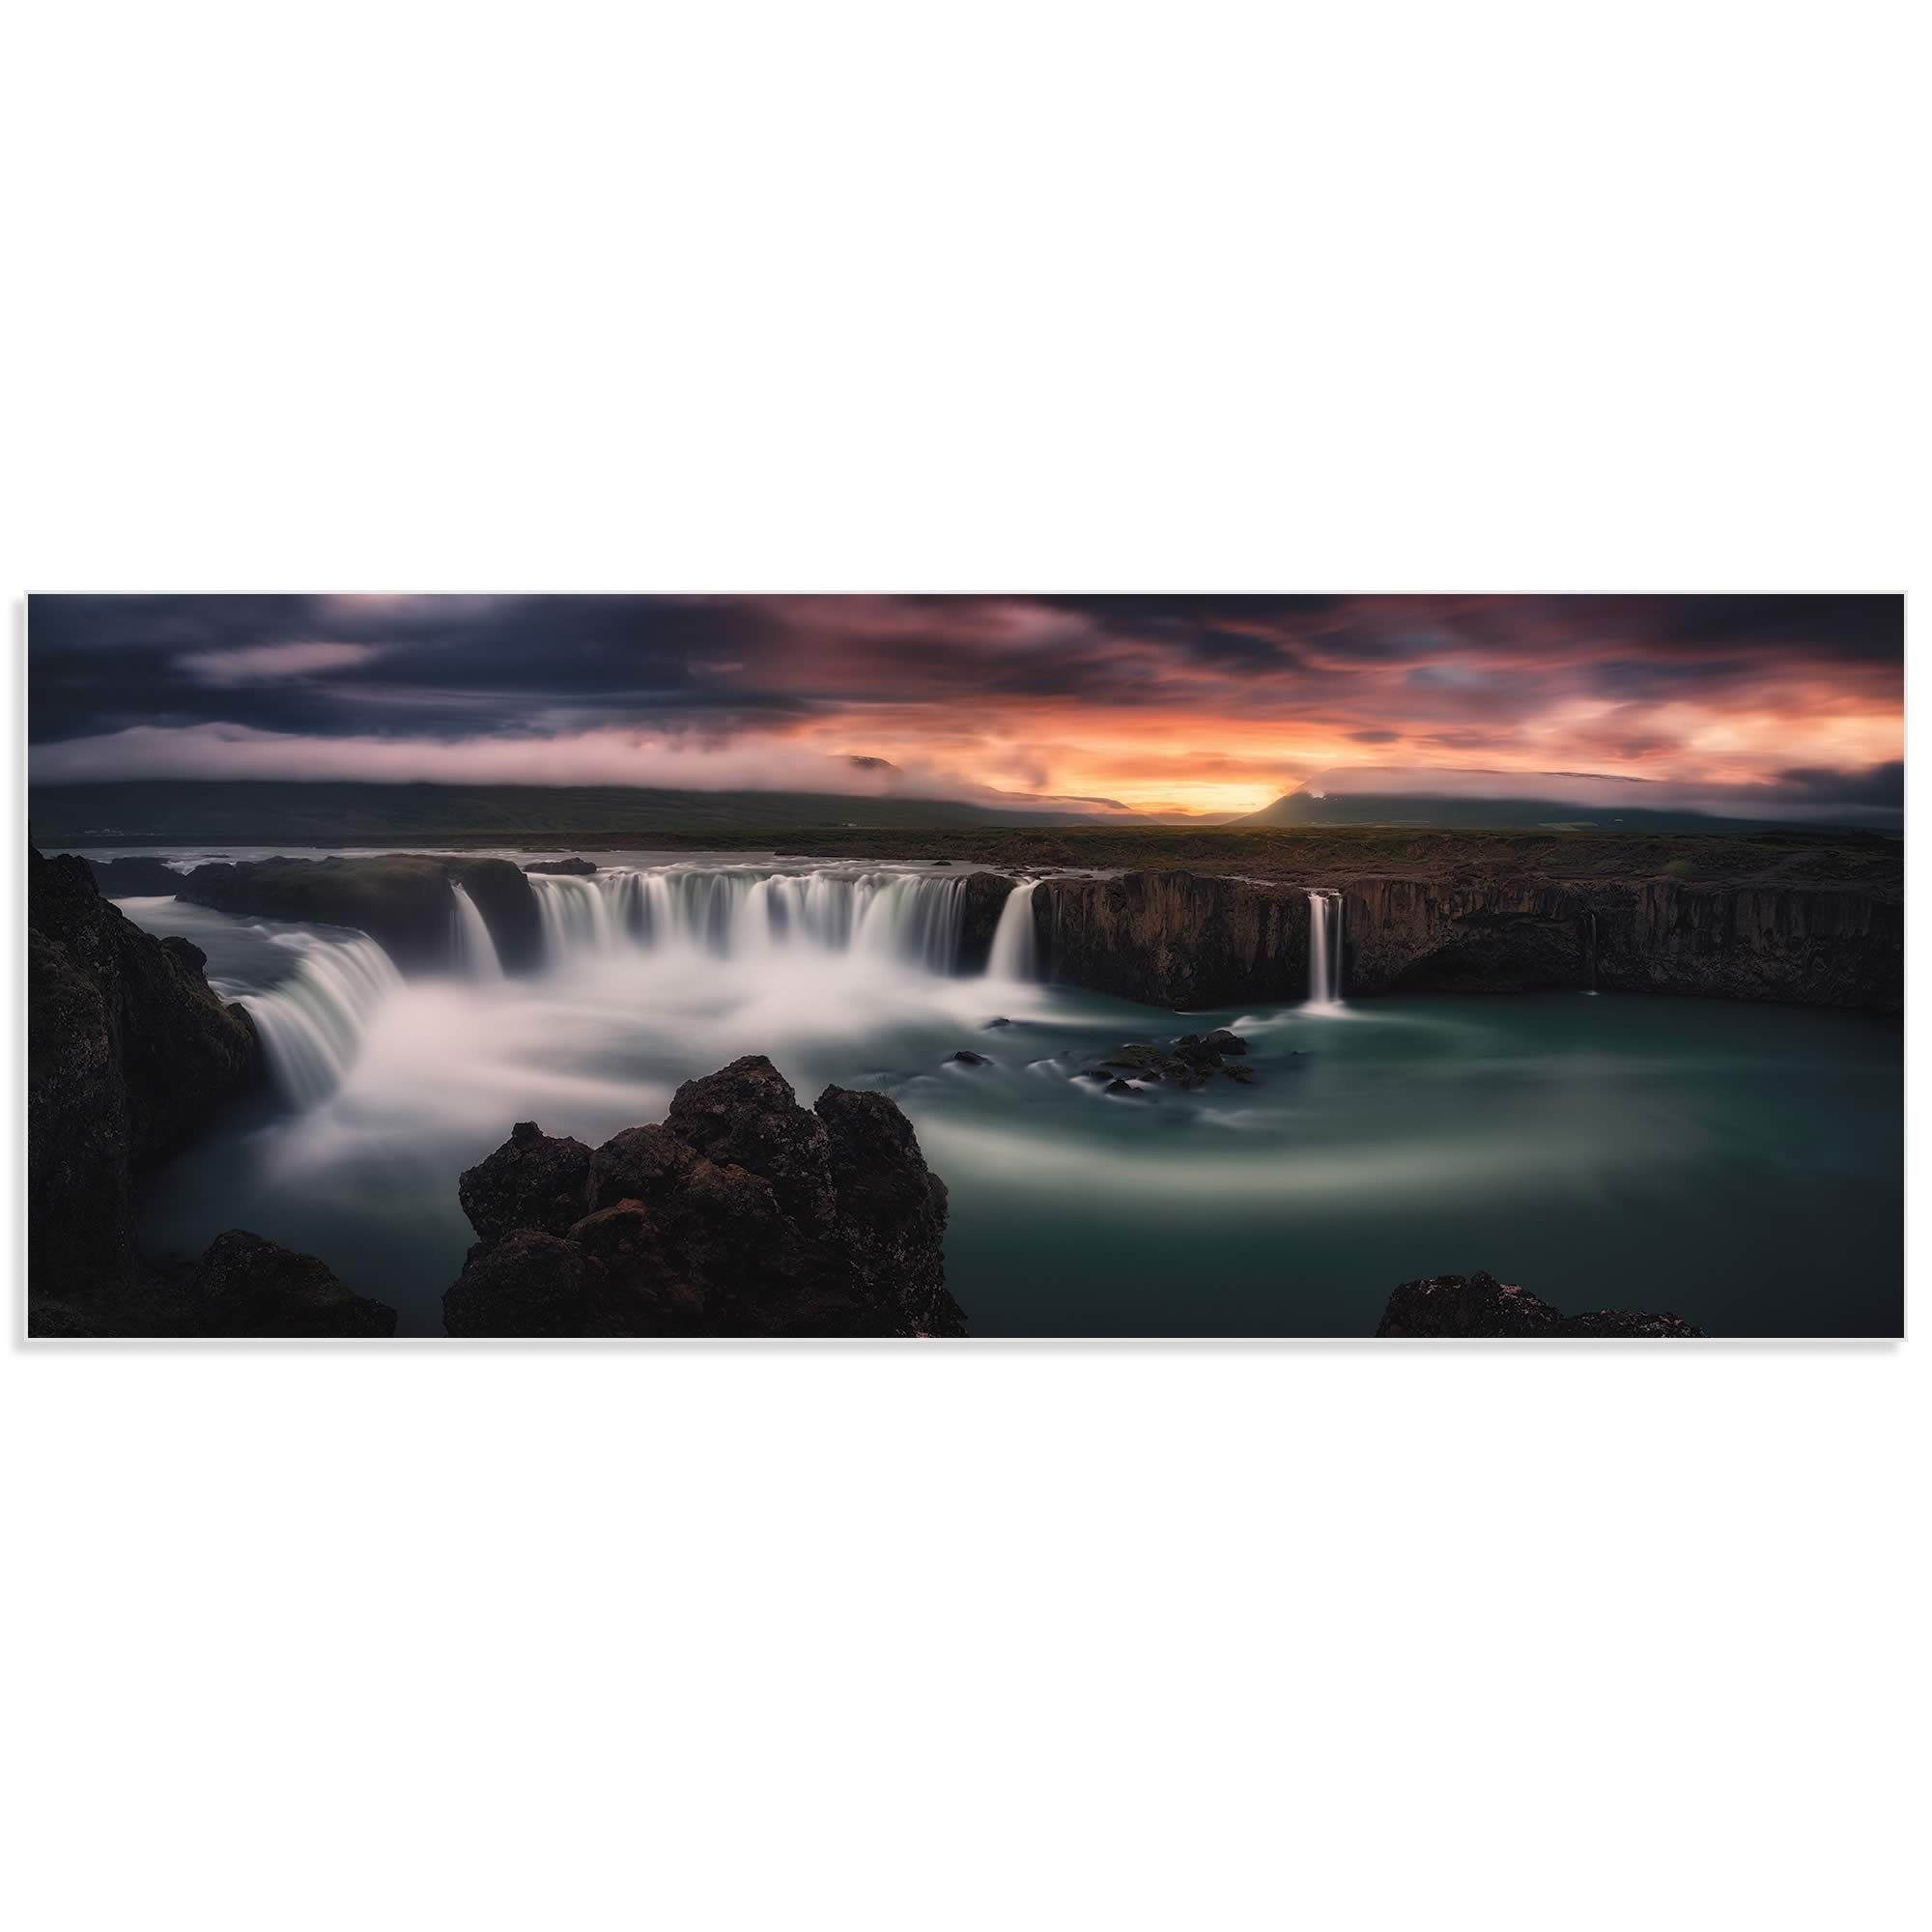 Fire and Waterfalls by Stefan Mitterwallner - Waterfall Image on Metal or Acrylic - Alternate View 2